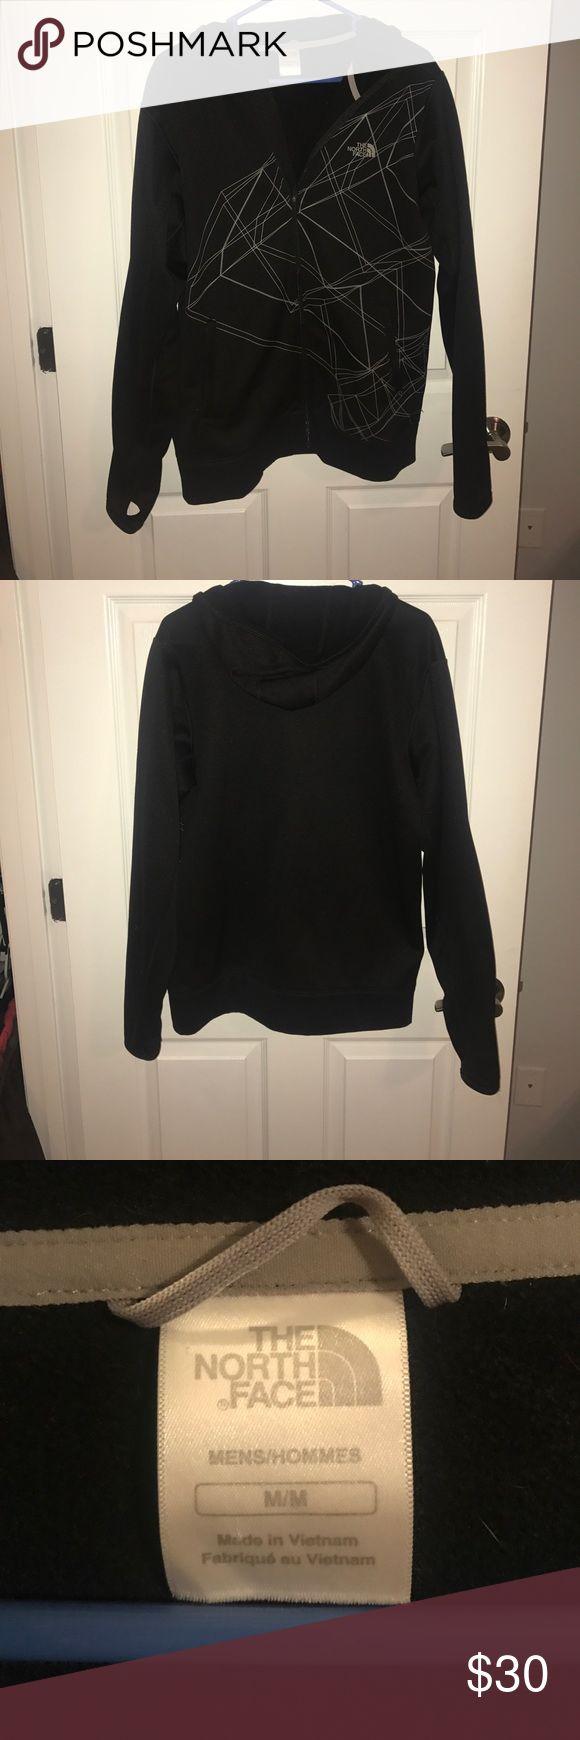 Men's black North Face Jacket Like new men's black North Face Jacket North Face Jackets & Coats Lightweight & Shirt Jackets